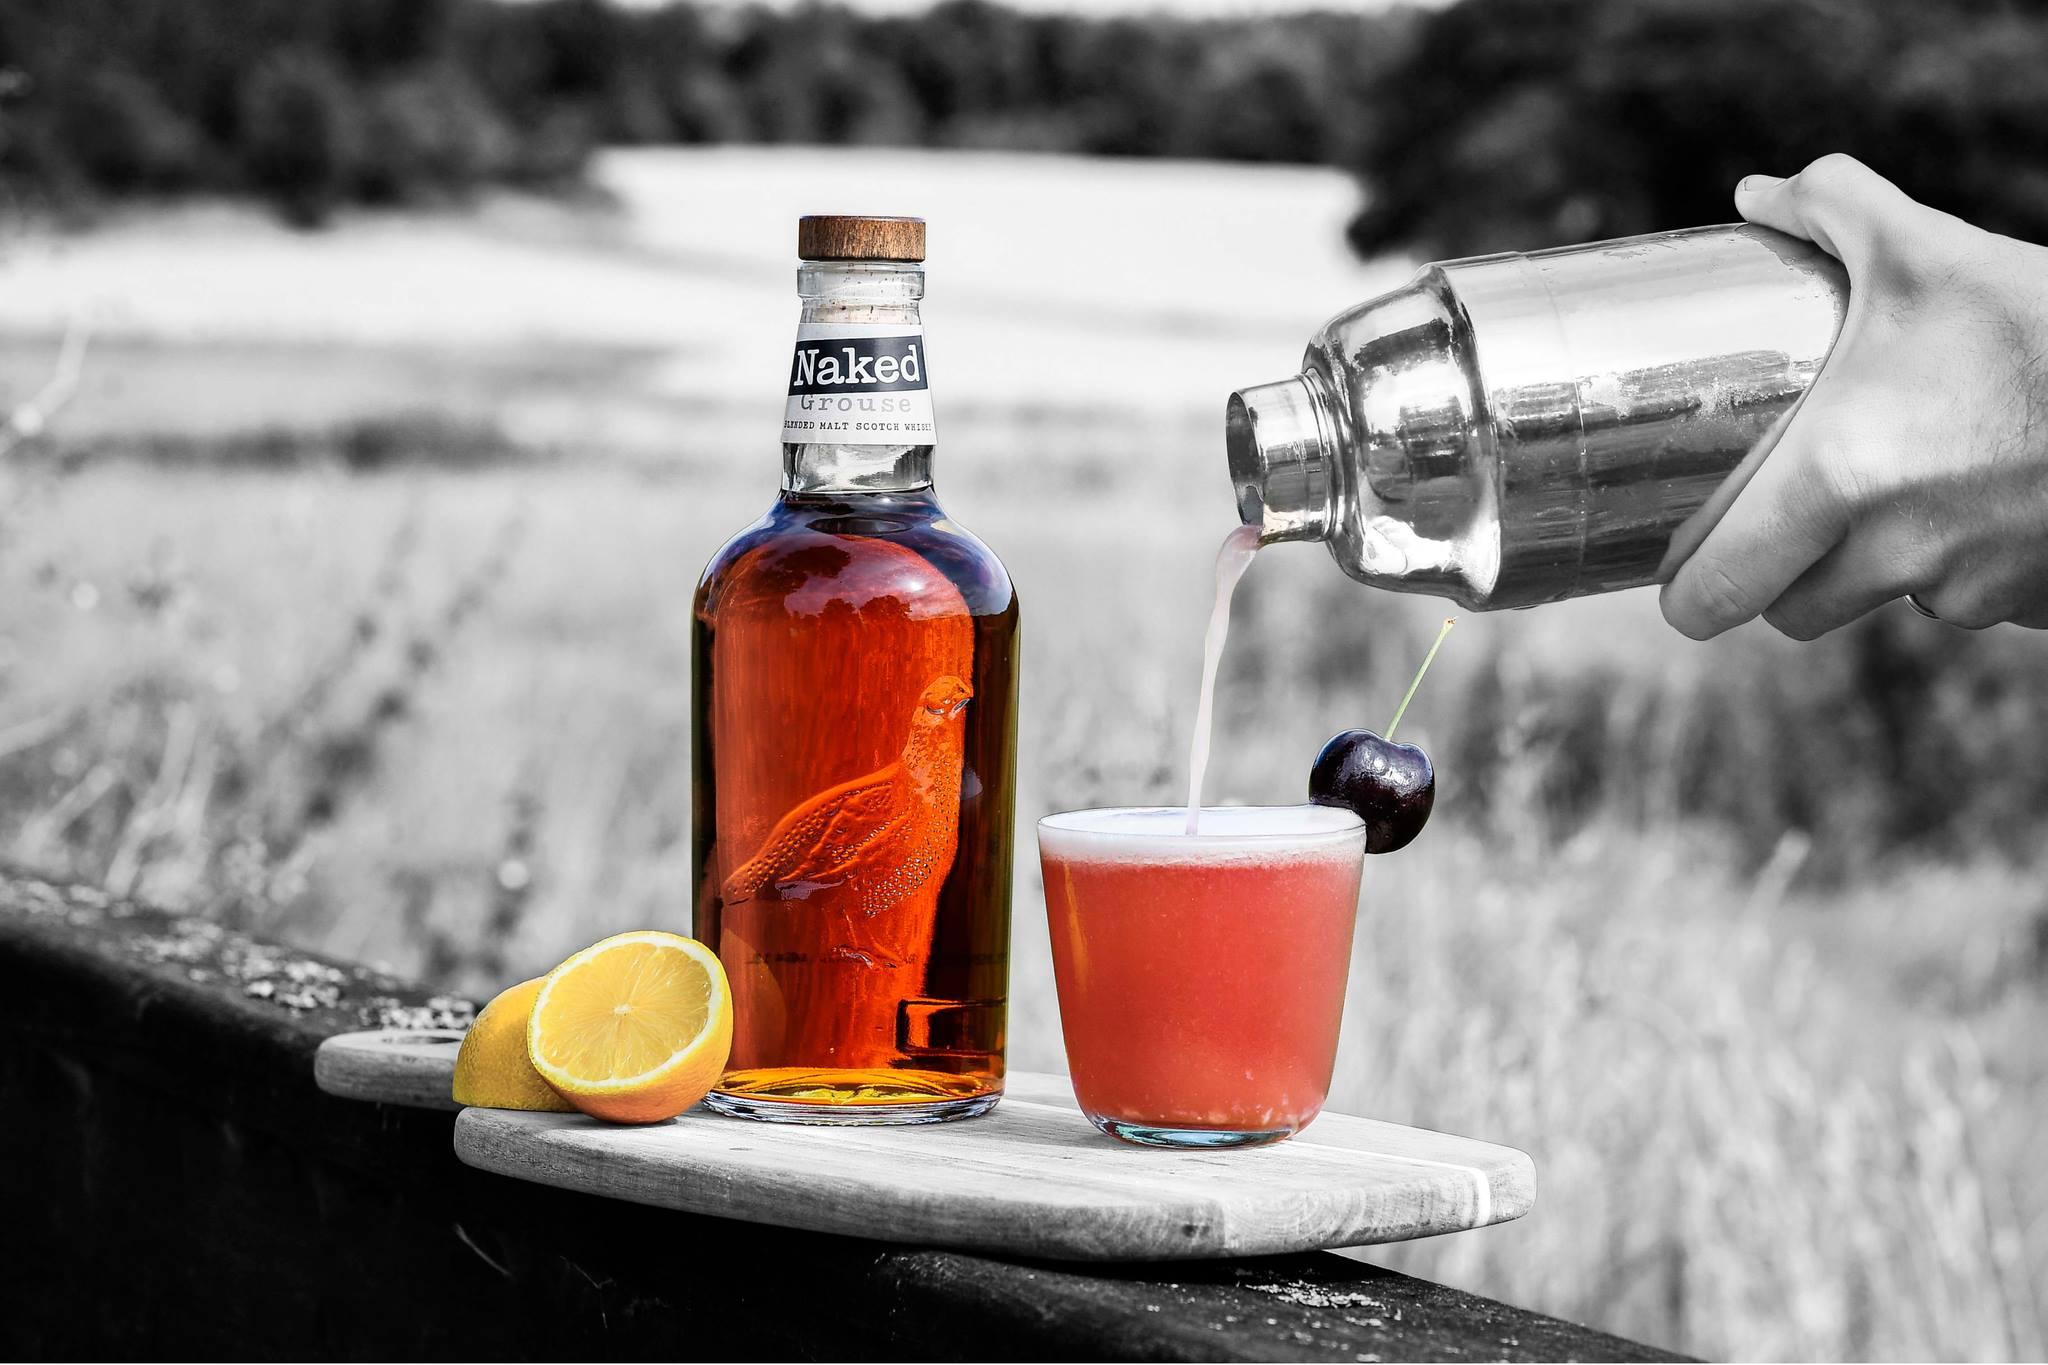 Naked Grouse - Whisky